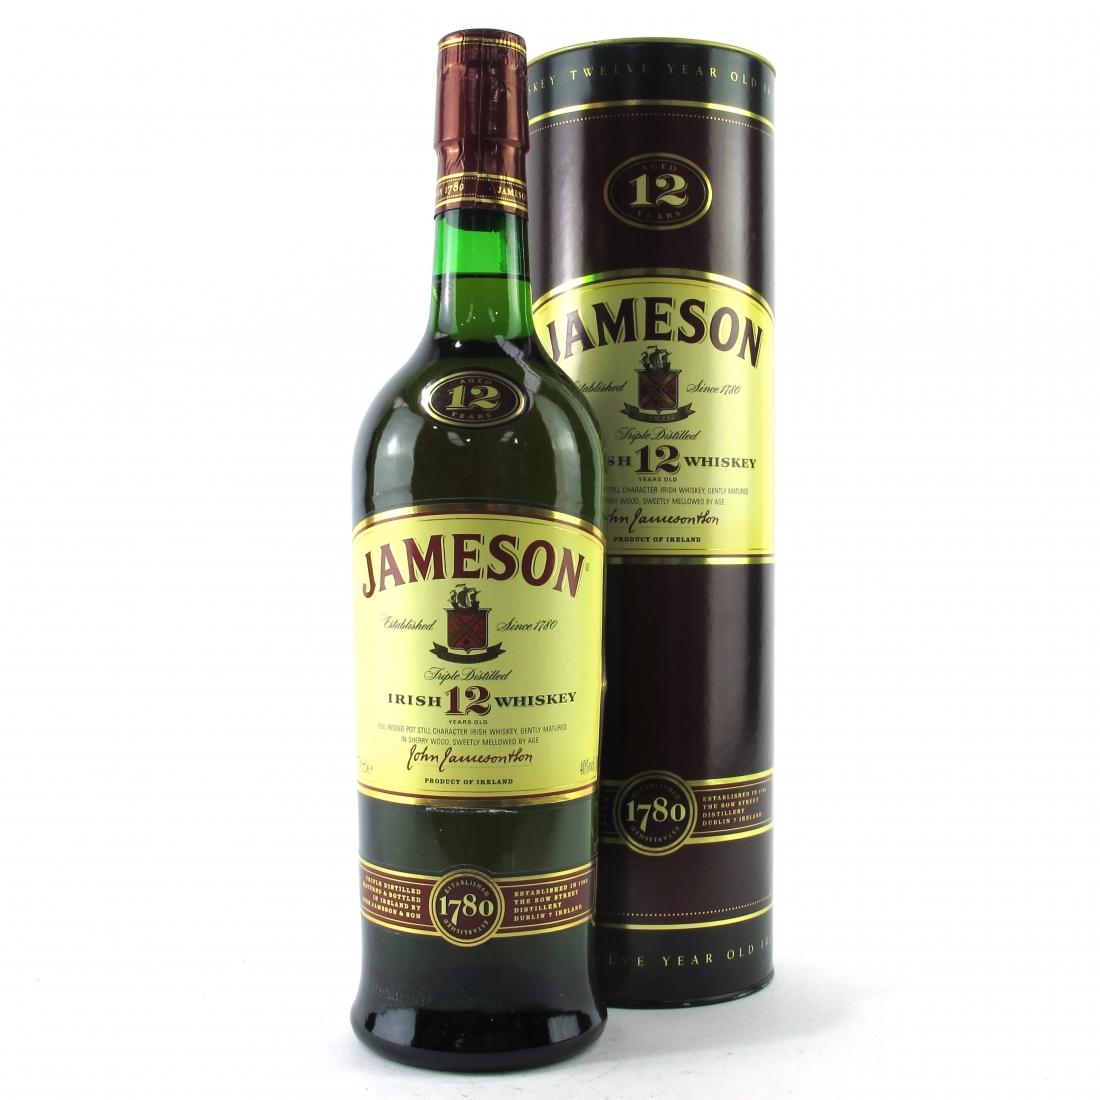 Jameson 12 Year Old